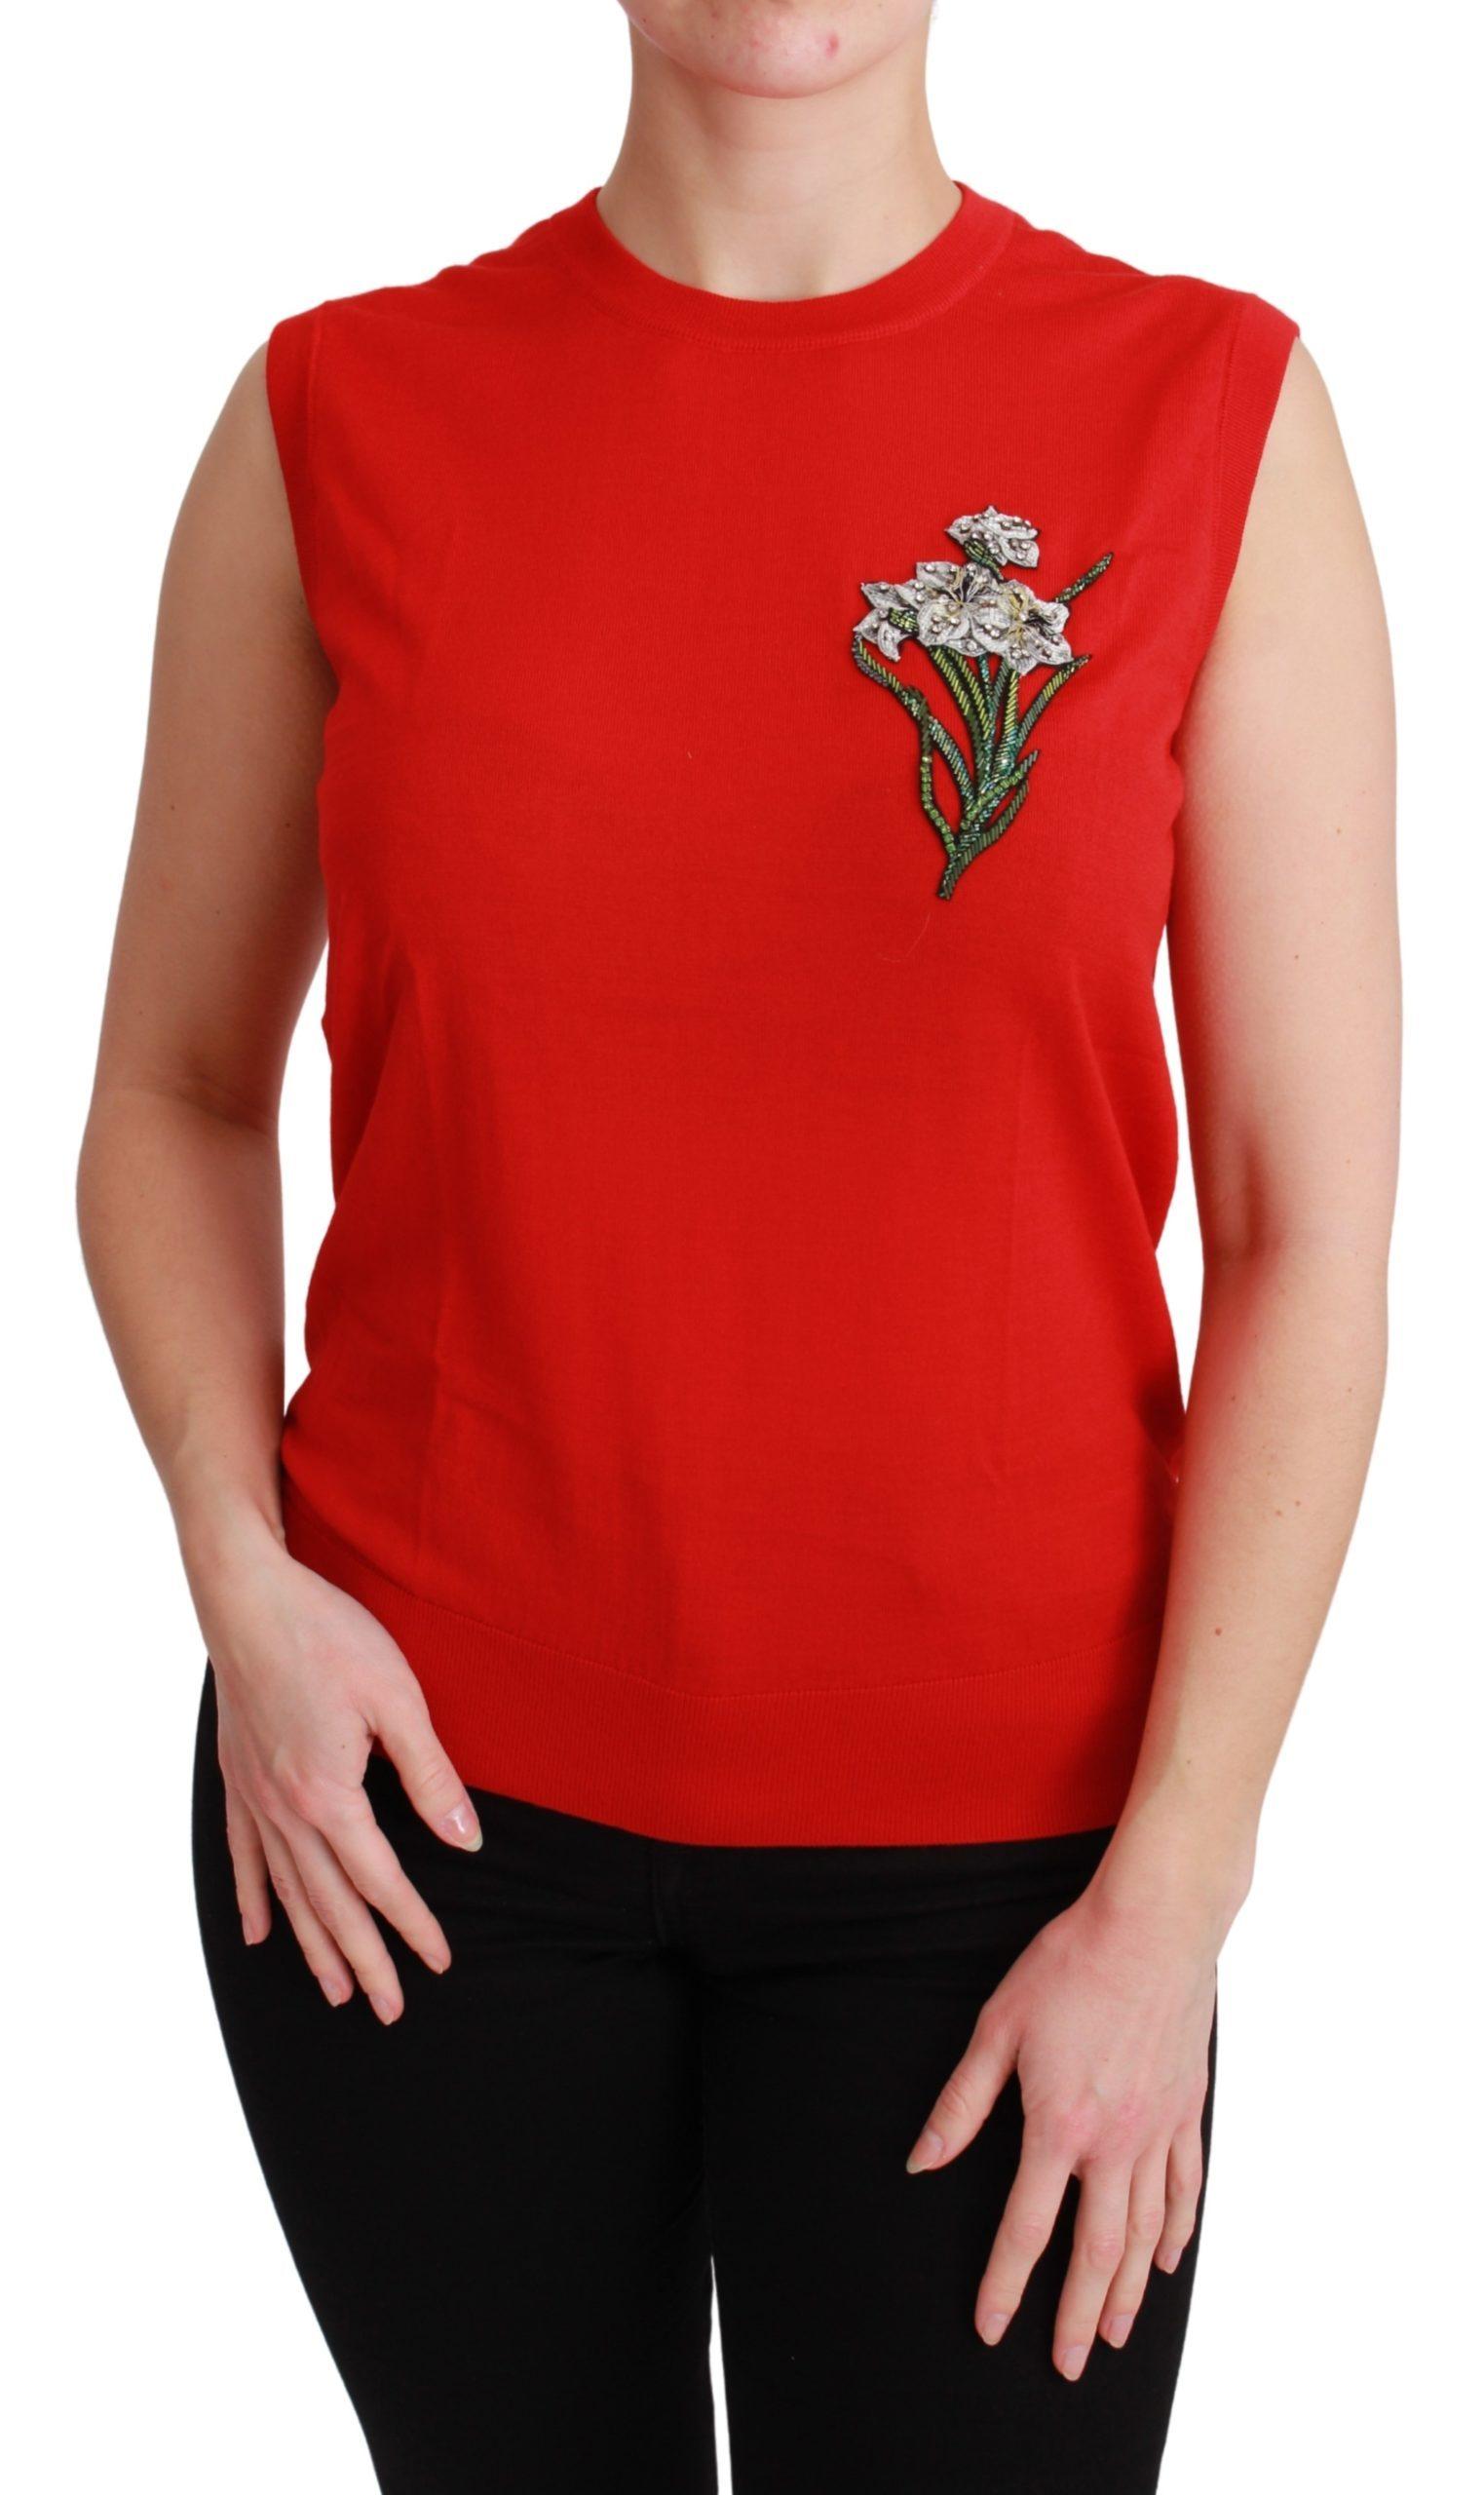 Dolce & Gabbana Women's Crystal Flower Top Red TSH4584 - IT44 L